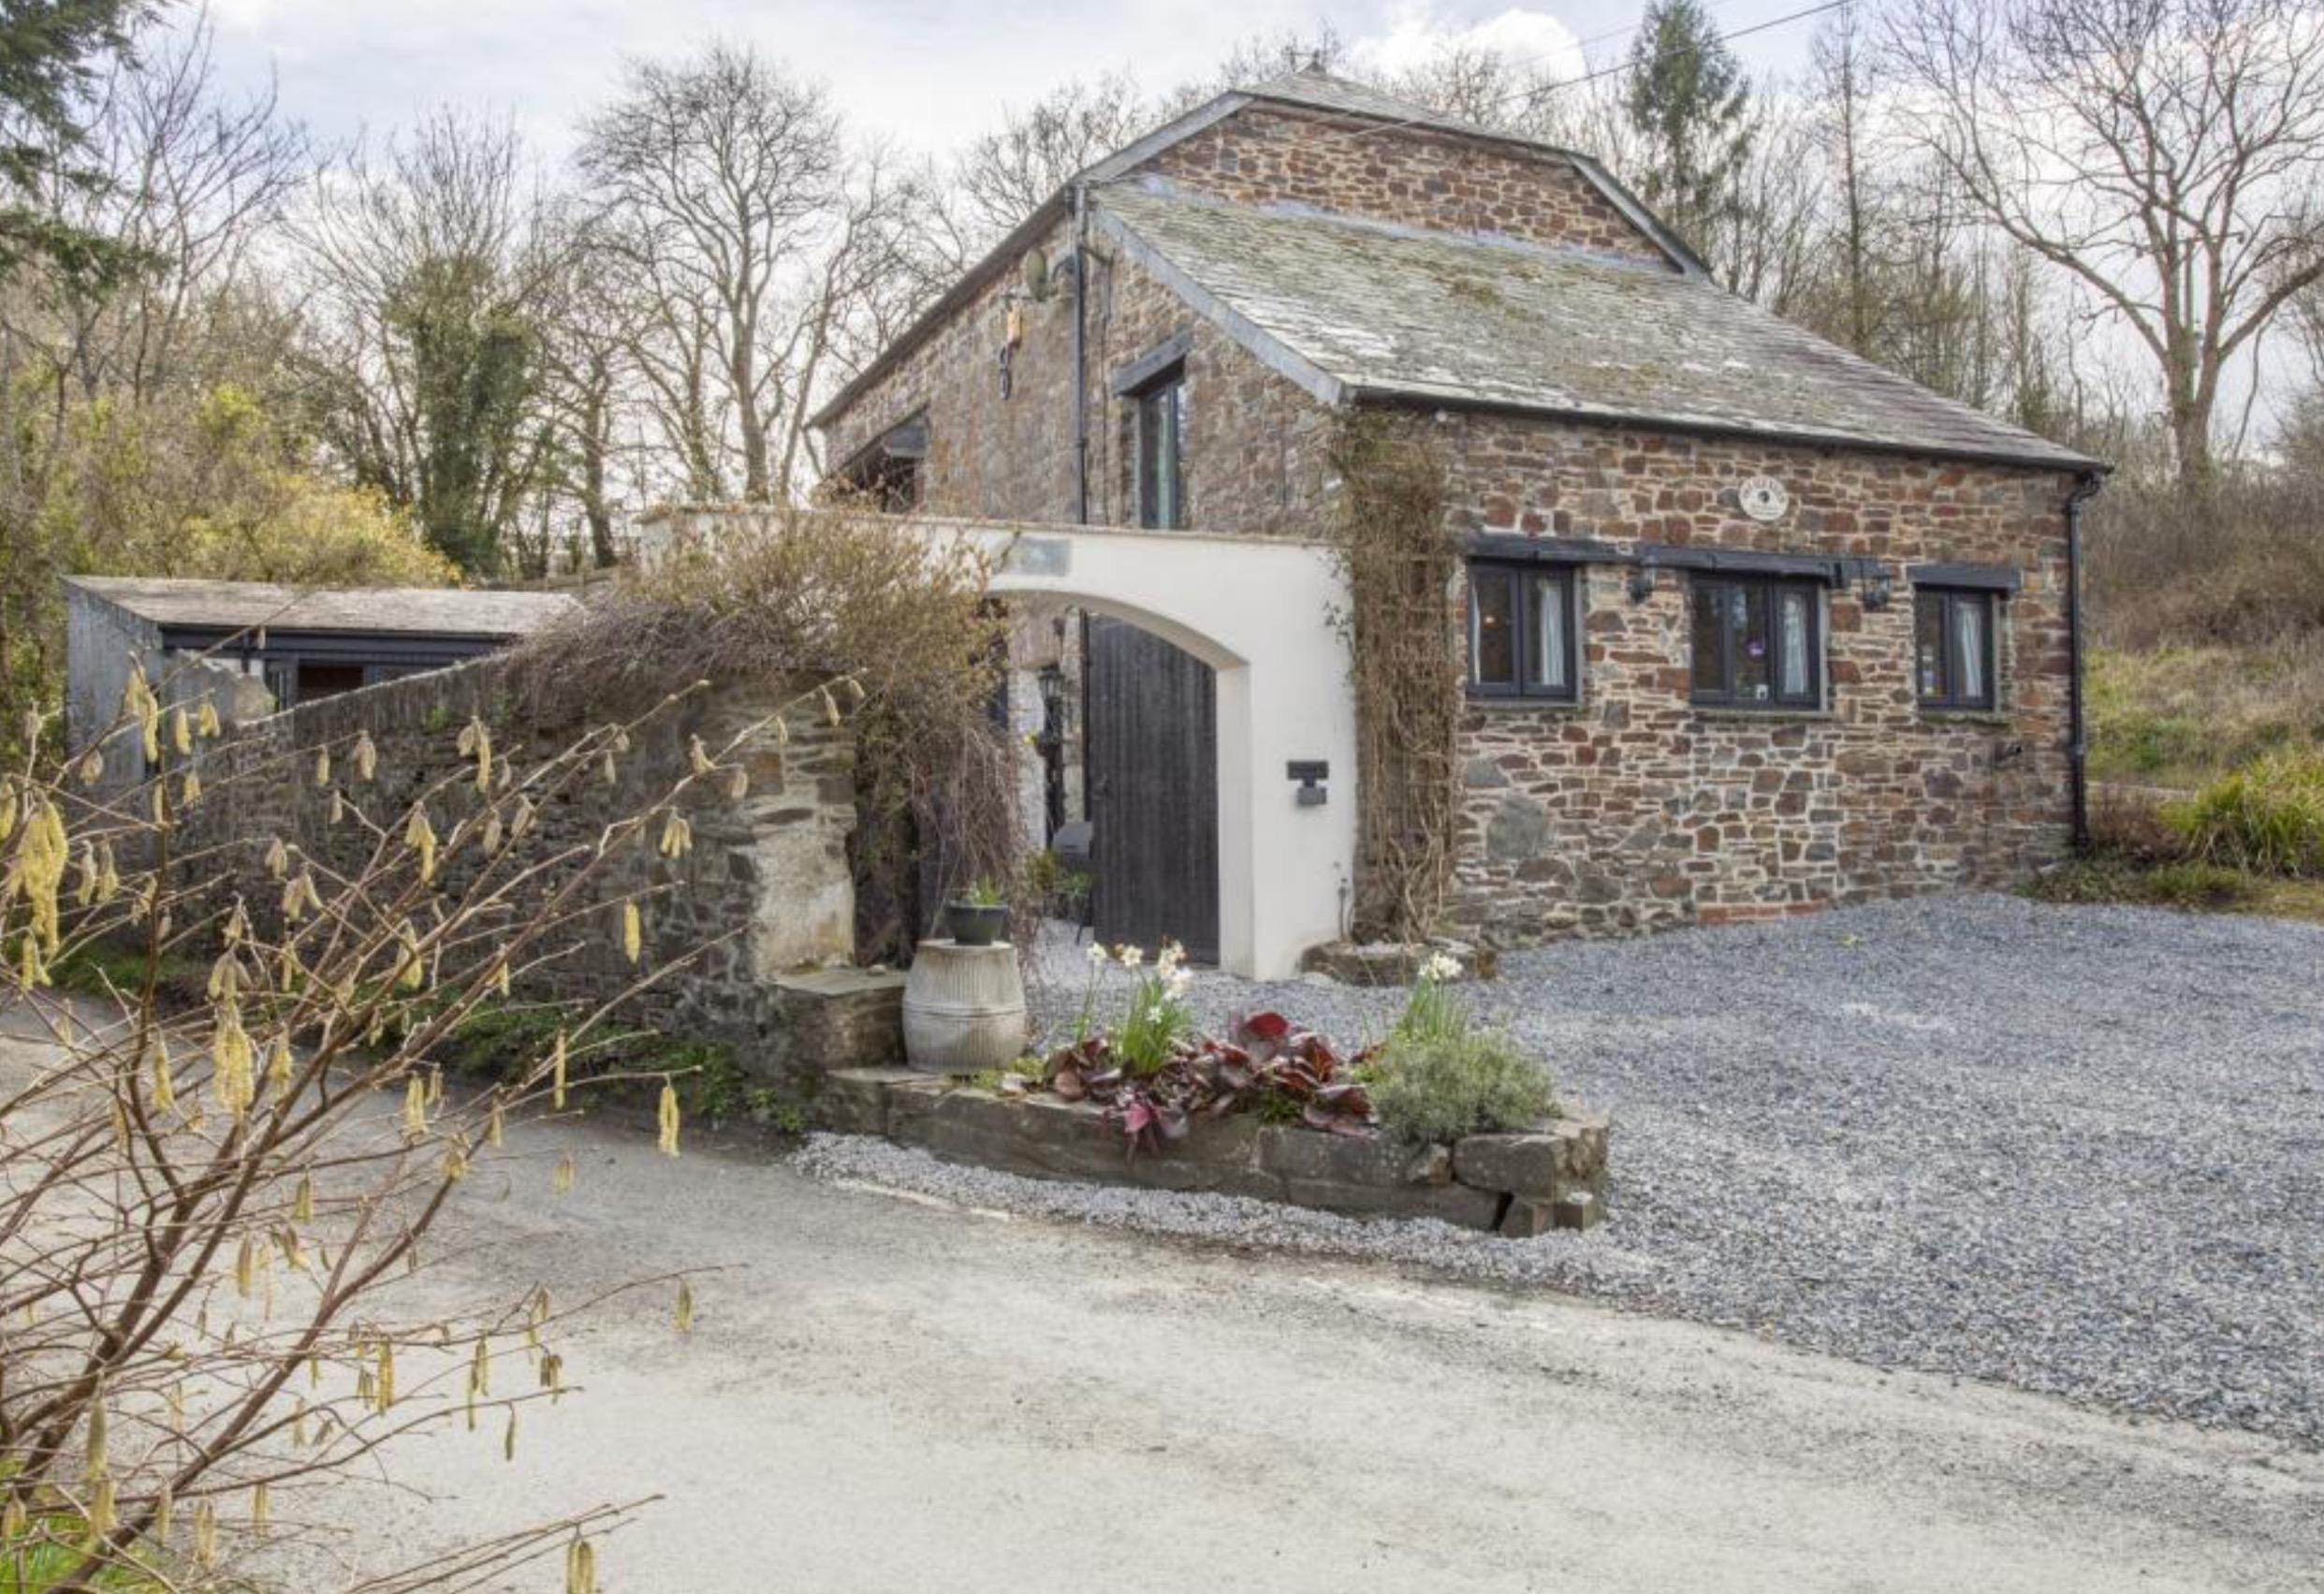 The Studio Barn